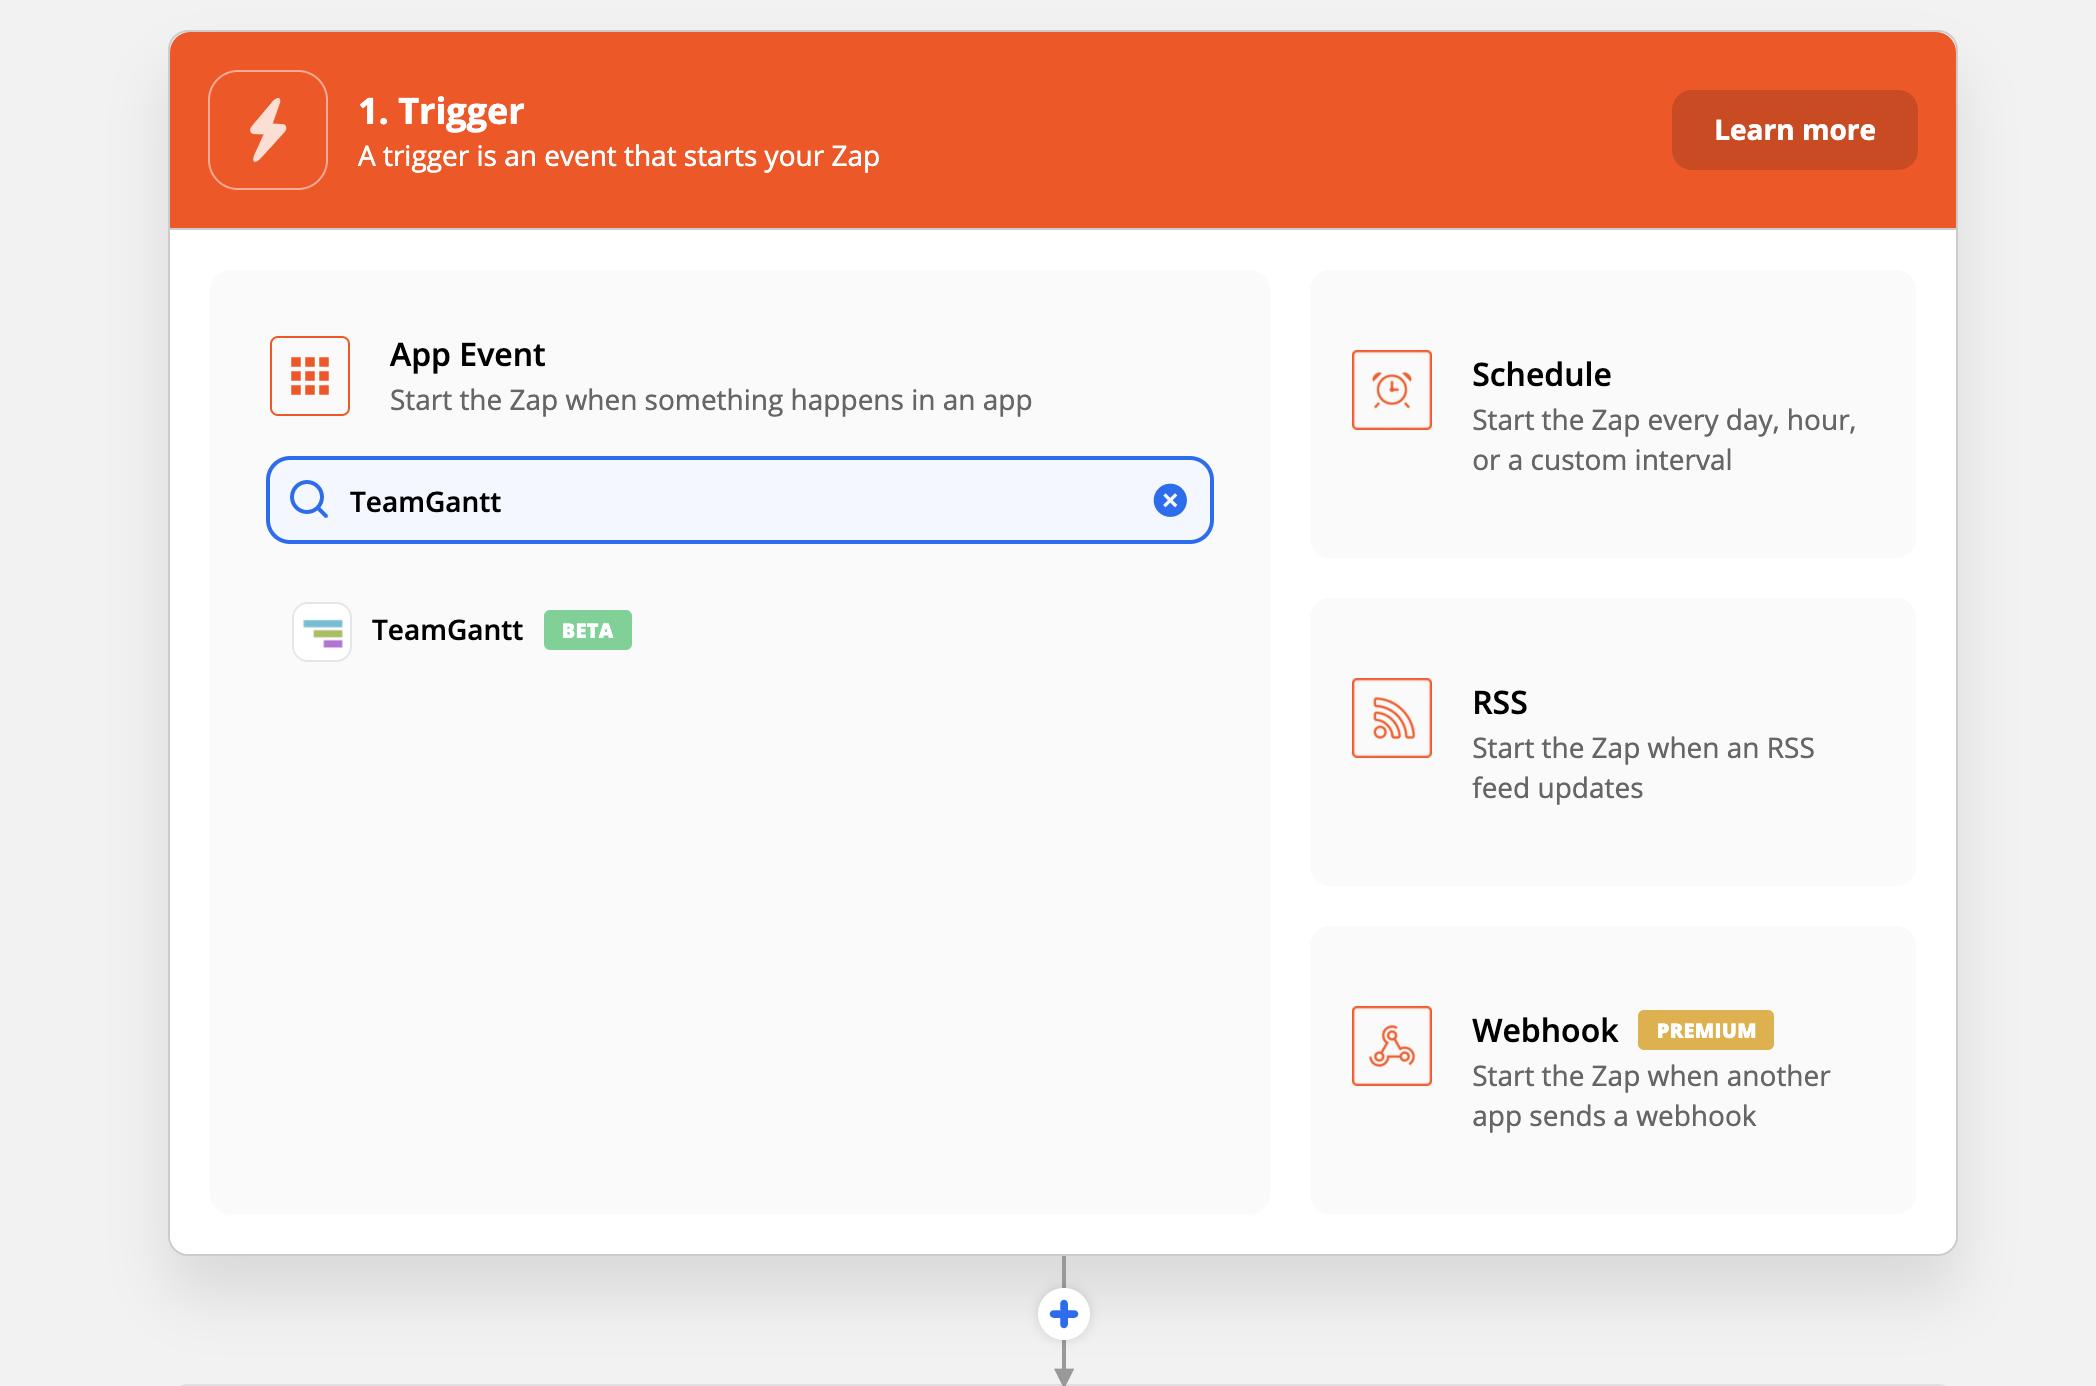 Activating the TeamGantt integration in Zapier